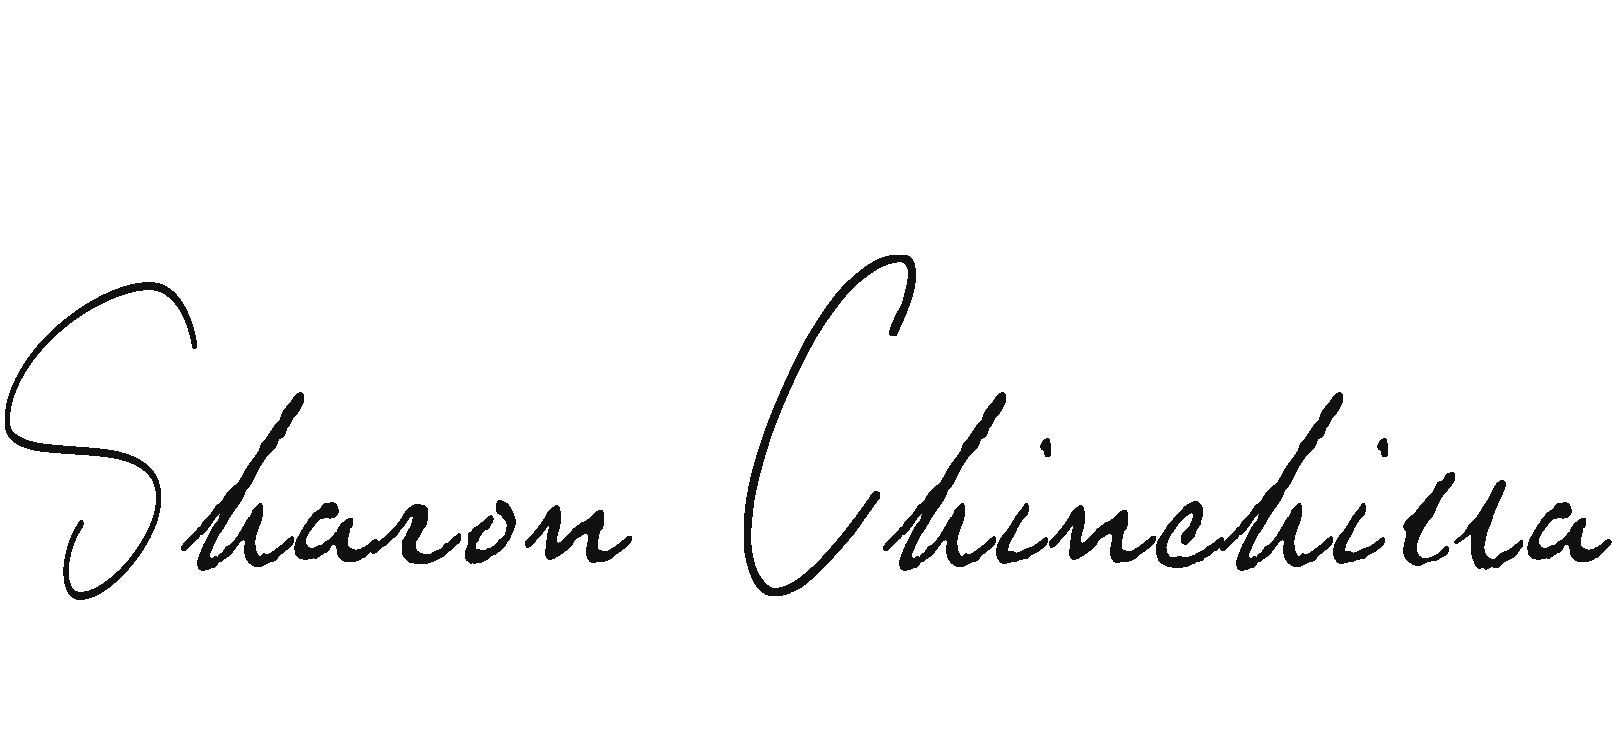 Sharon Chinchilla Firma Negro@4x.png